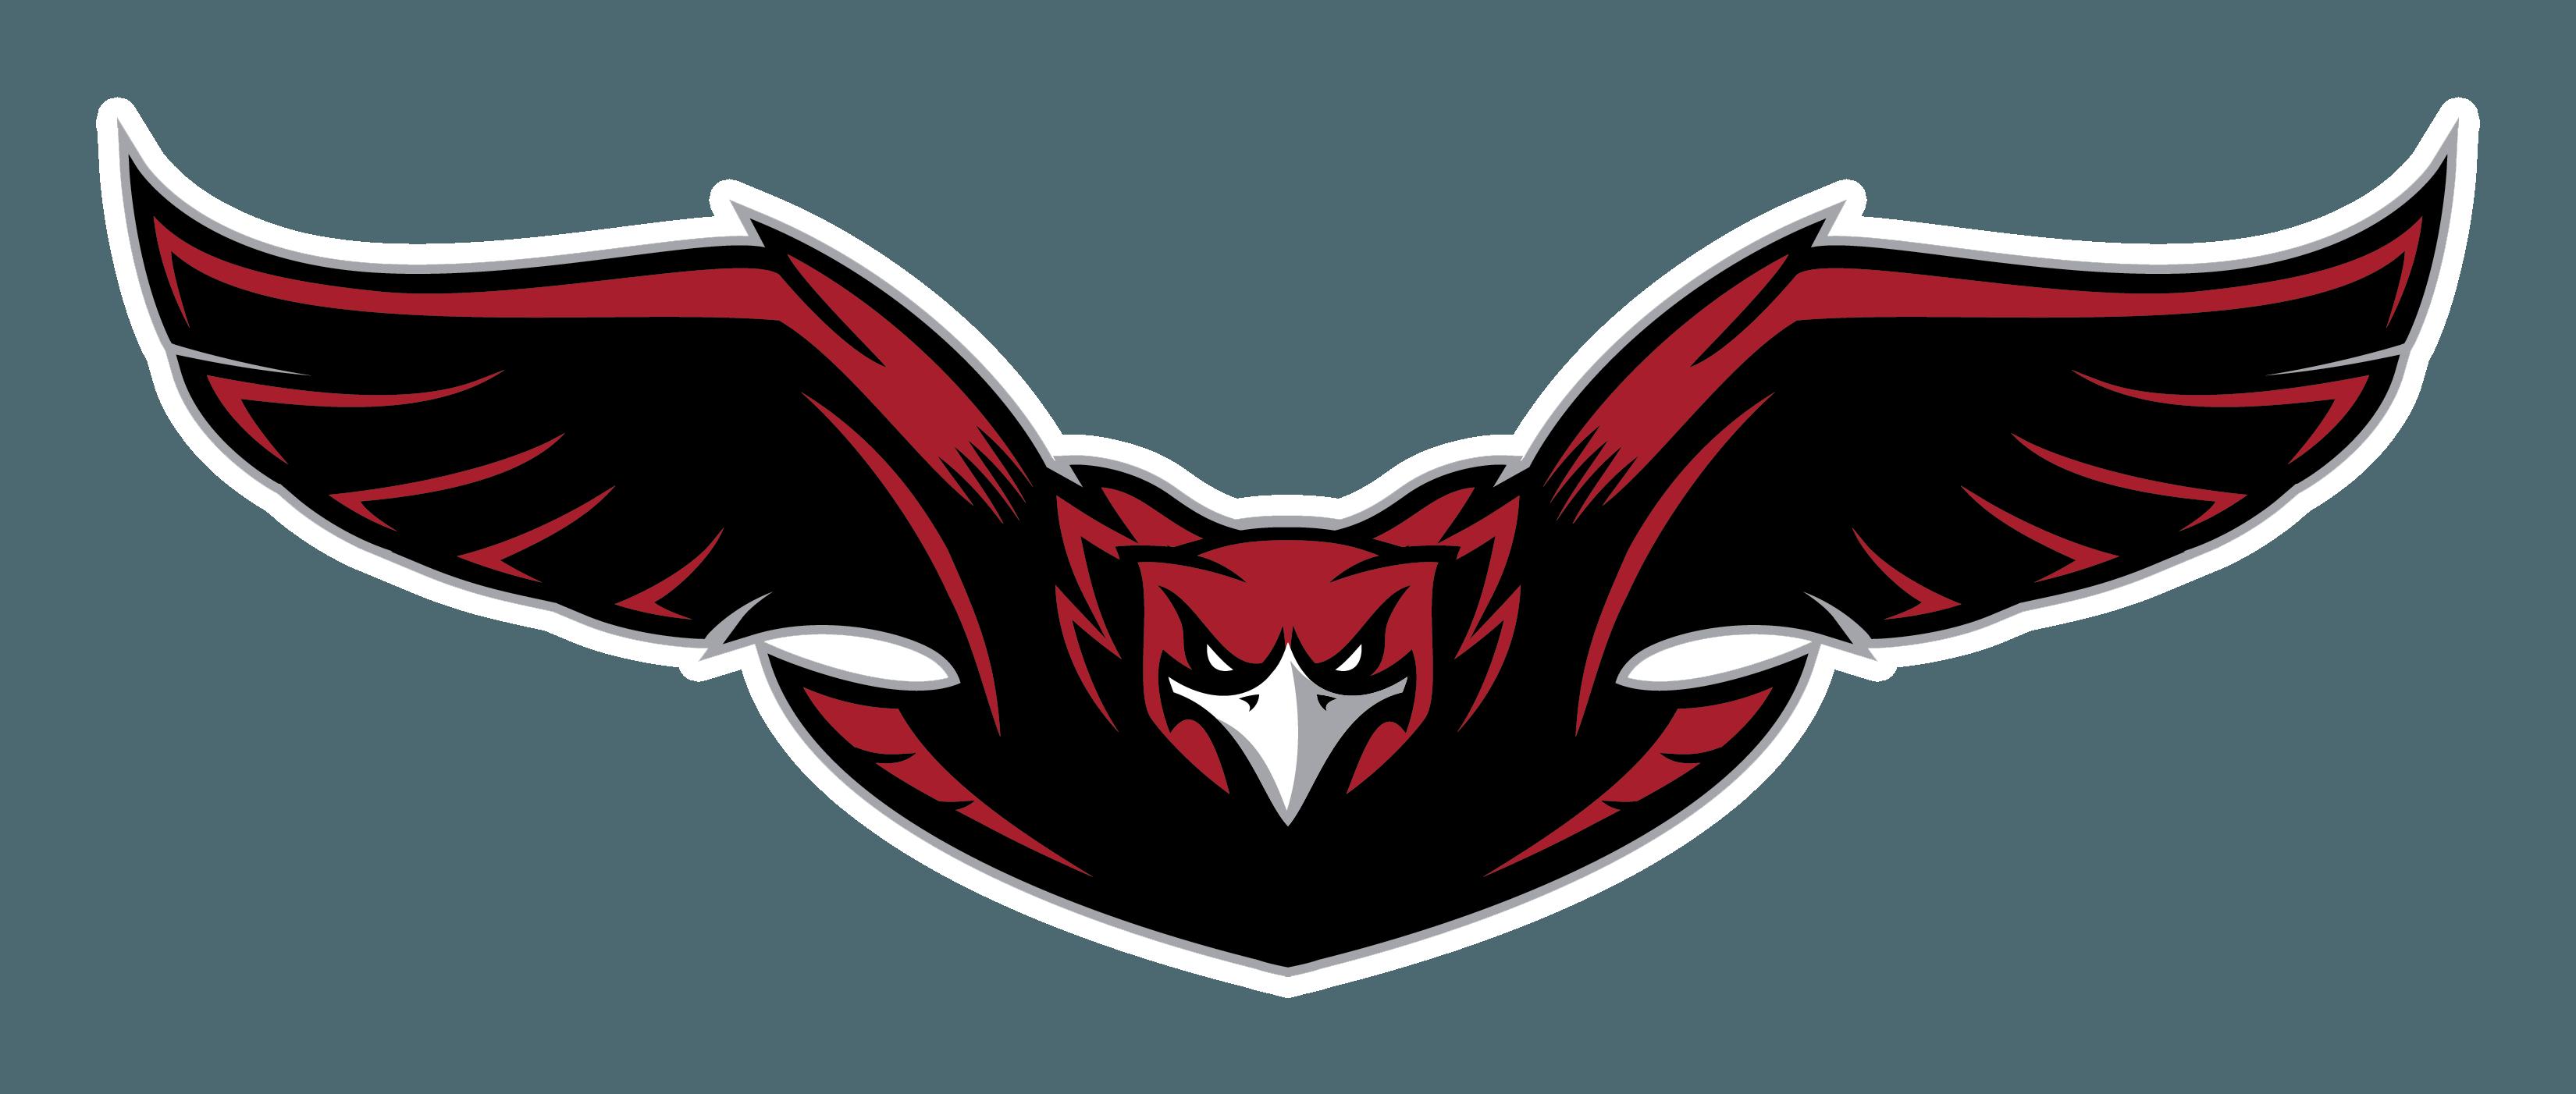 RedHawks Logo.